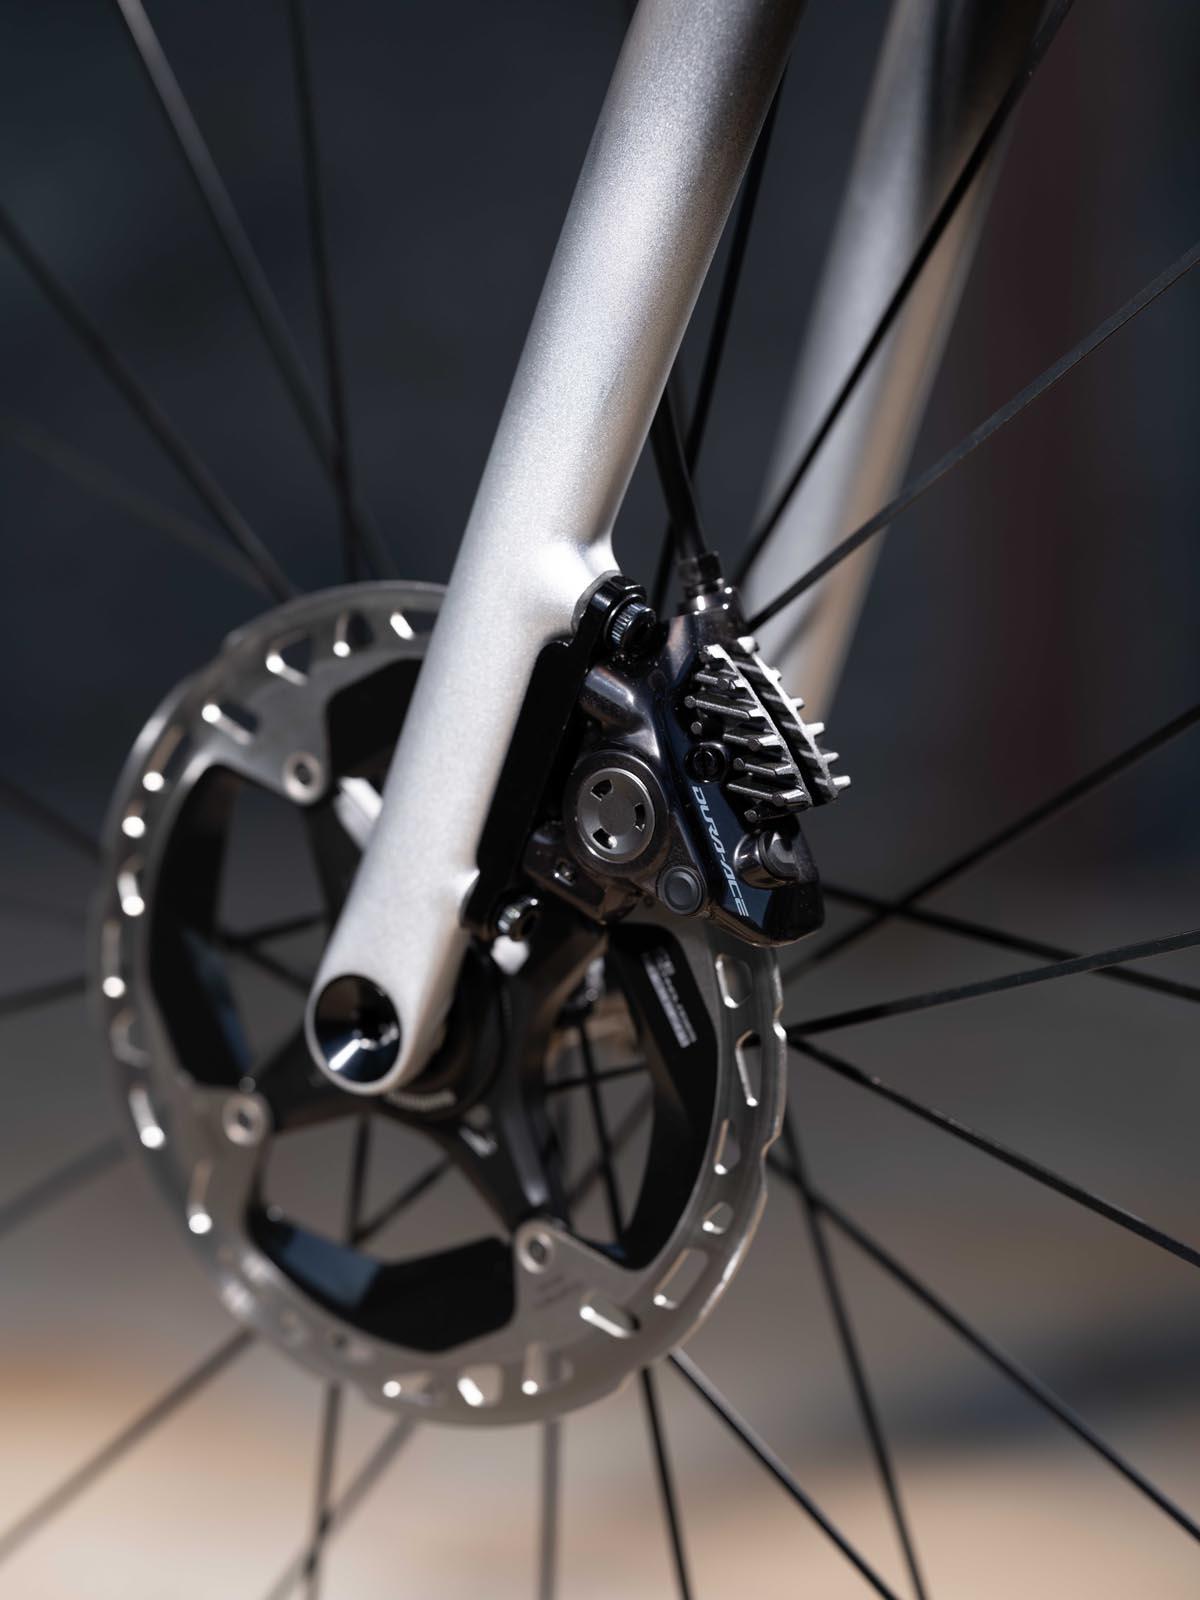 Shimano Dura-Ace 9200 brakes